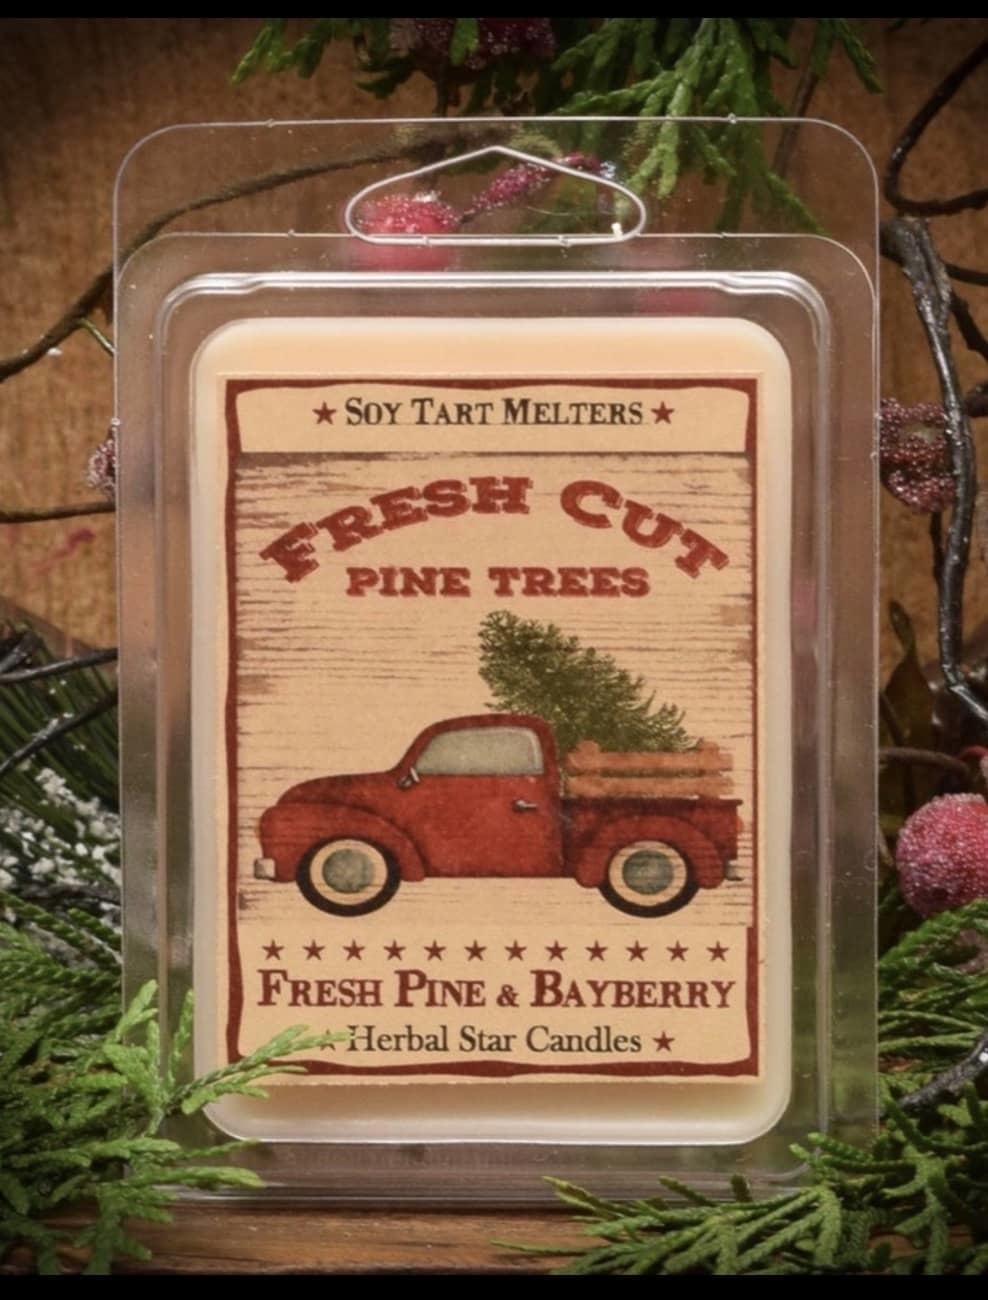 Herbal Star Candles Fresh Cut Pine Trees Fresh PIne & Bayberry  Mini Pack of Tarts